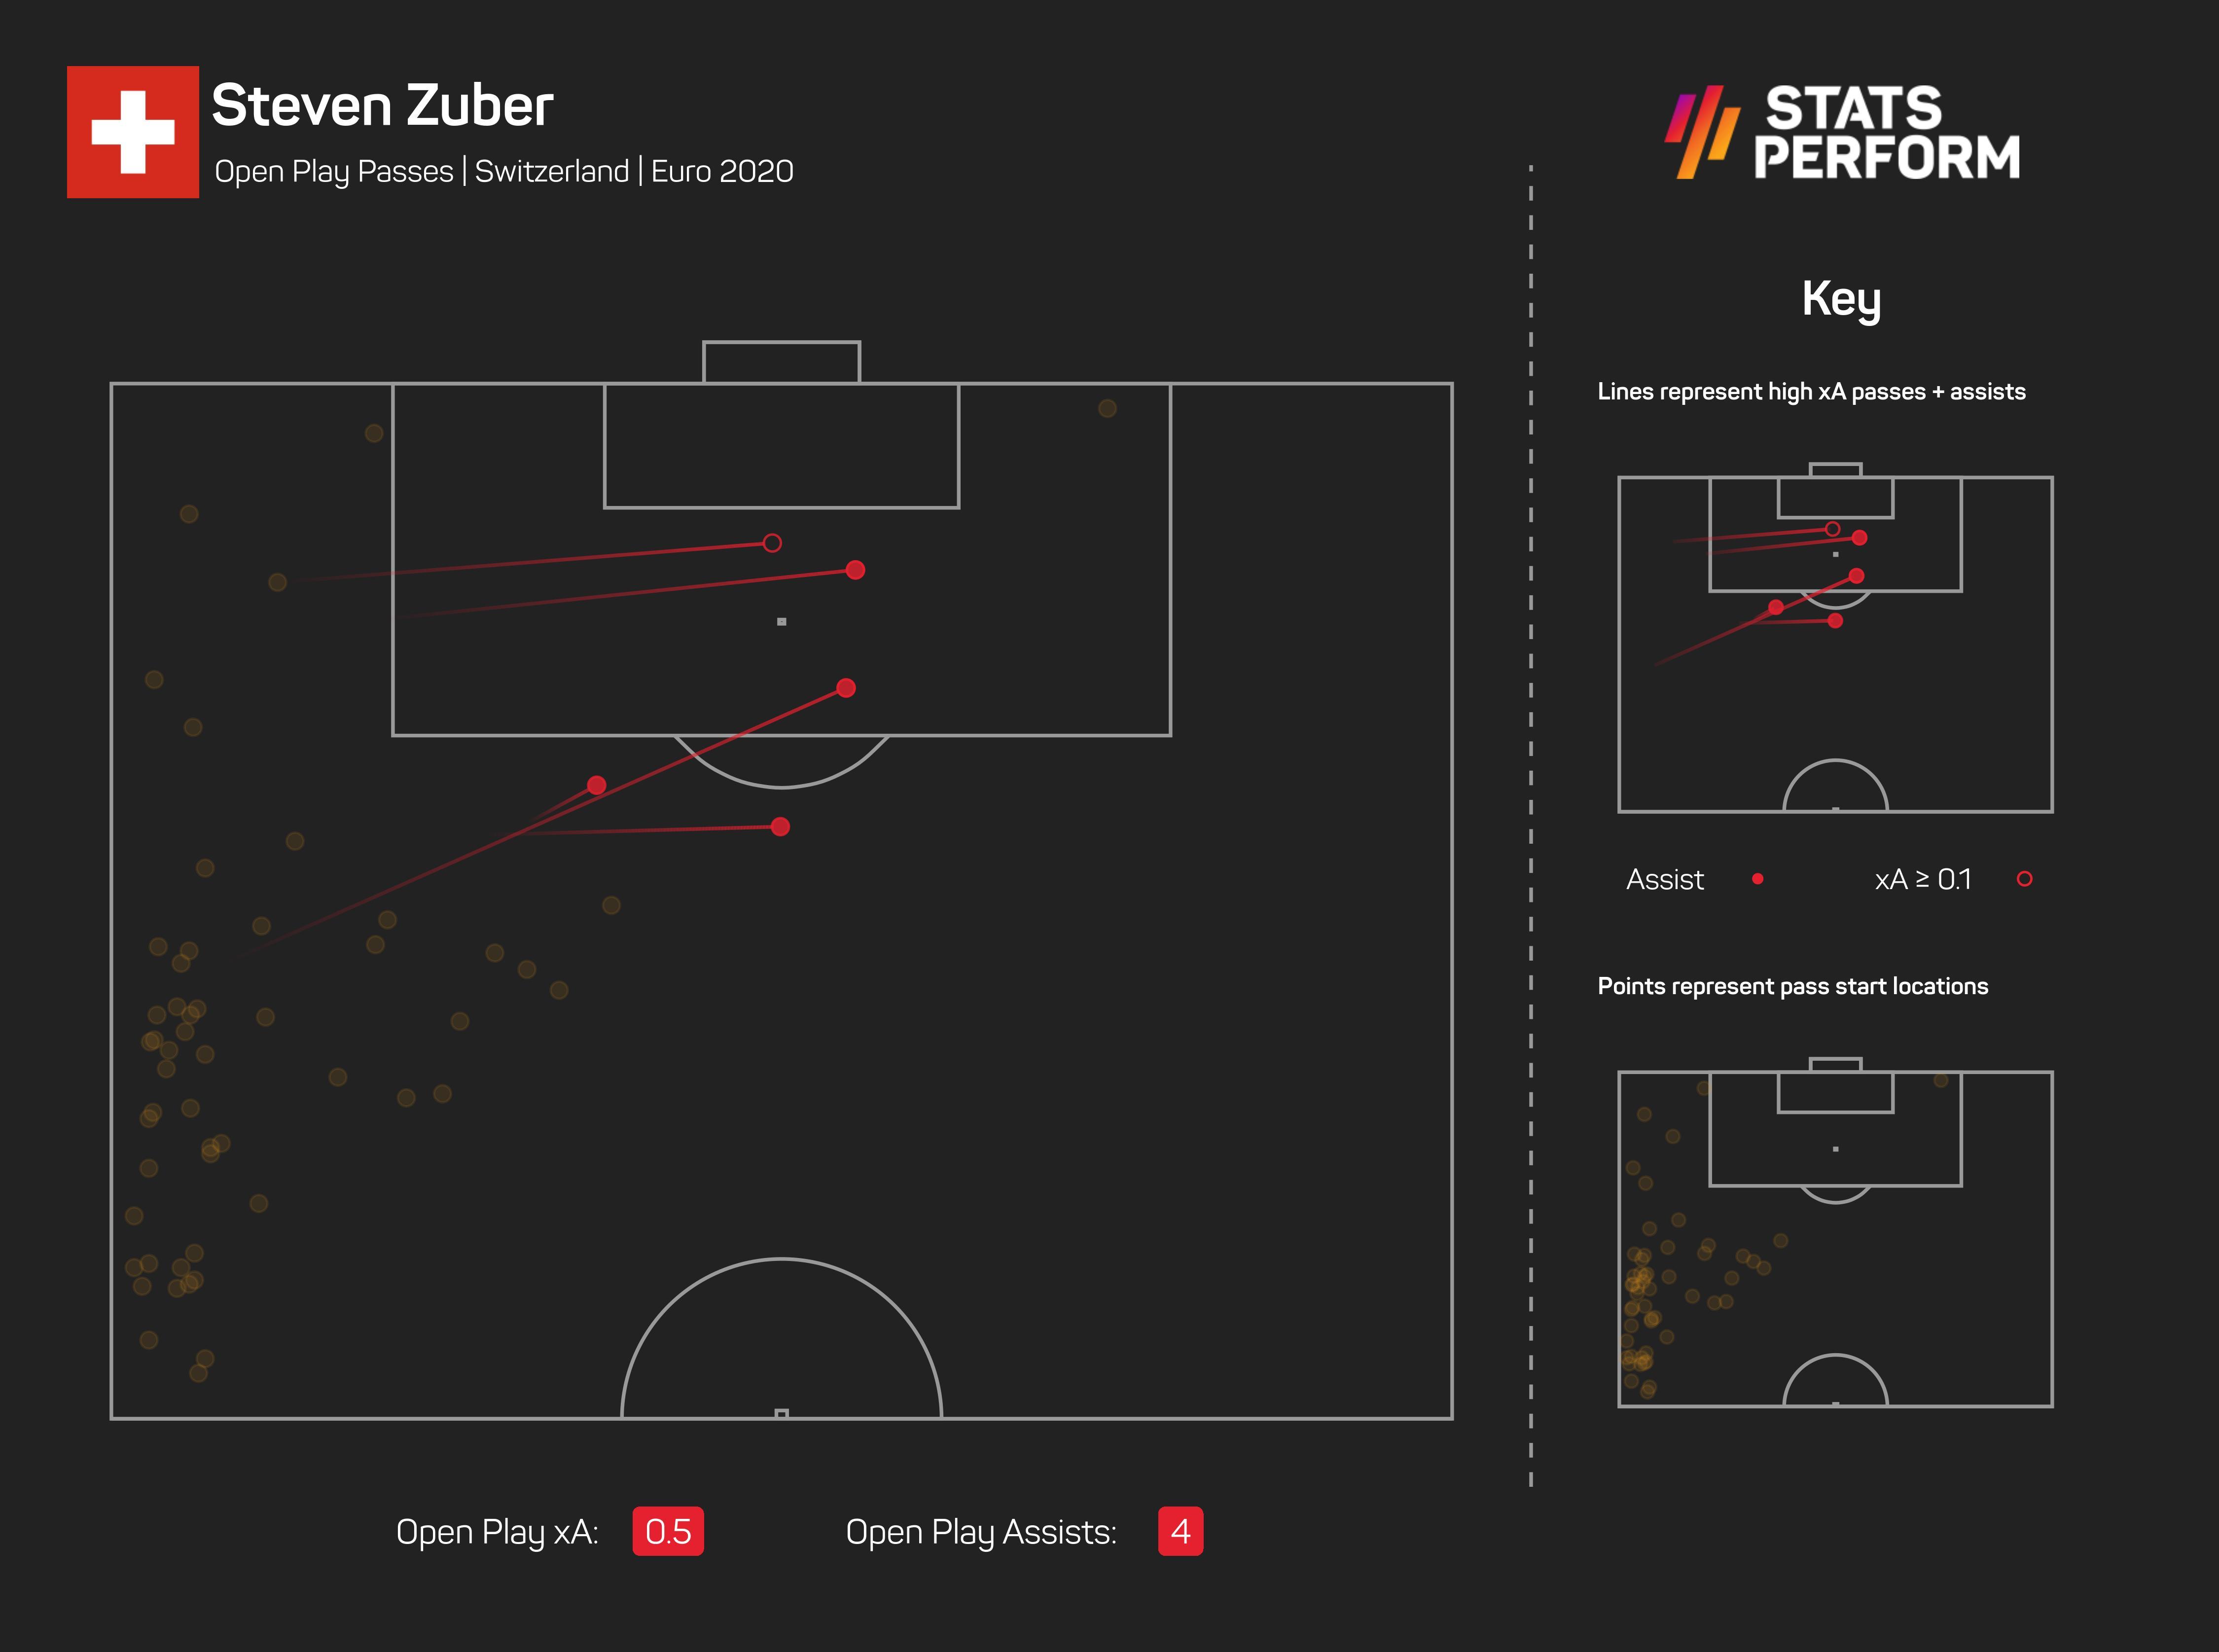 Steven Zubar xA Euro 2020